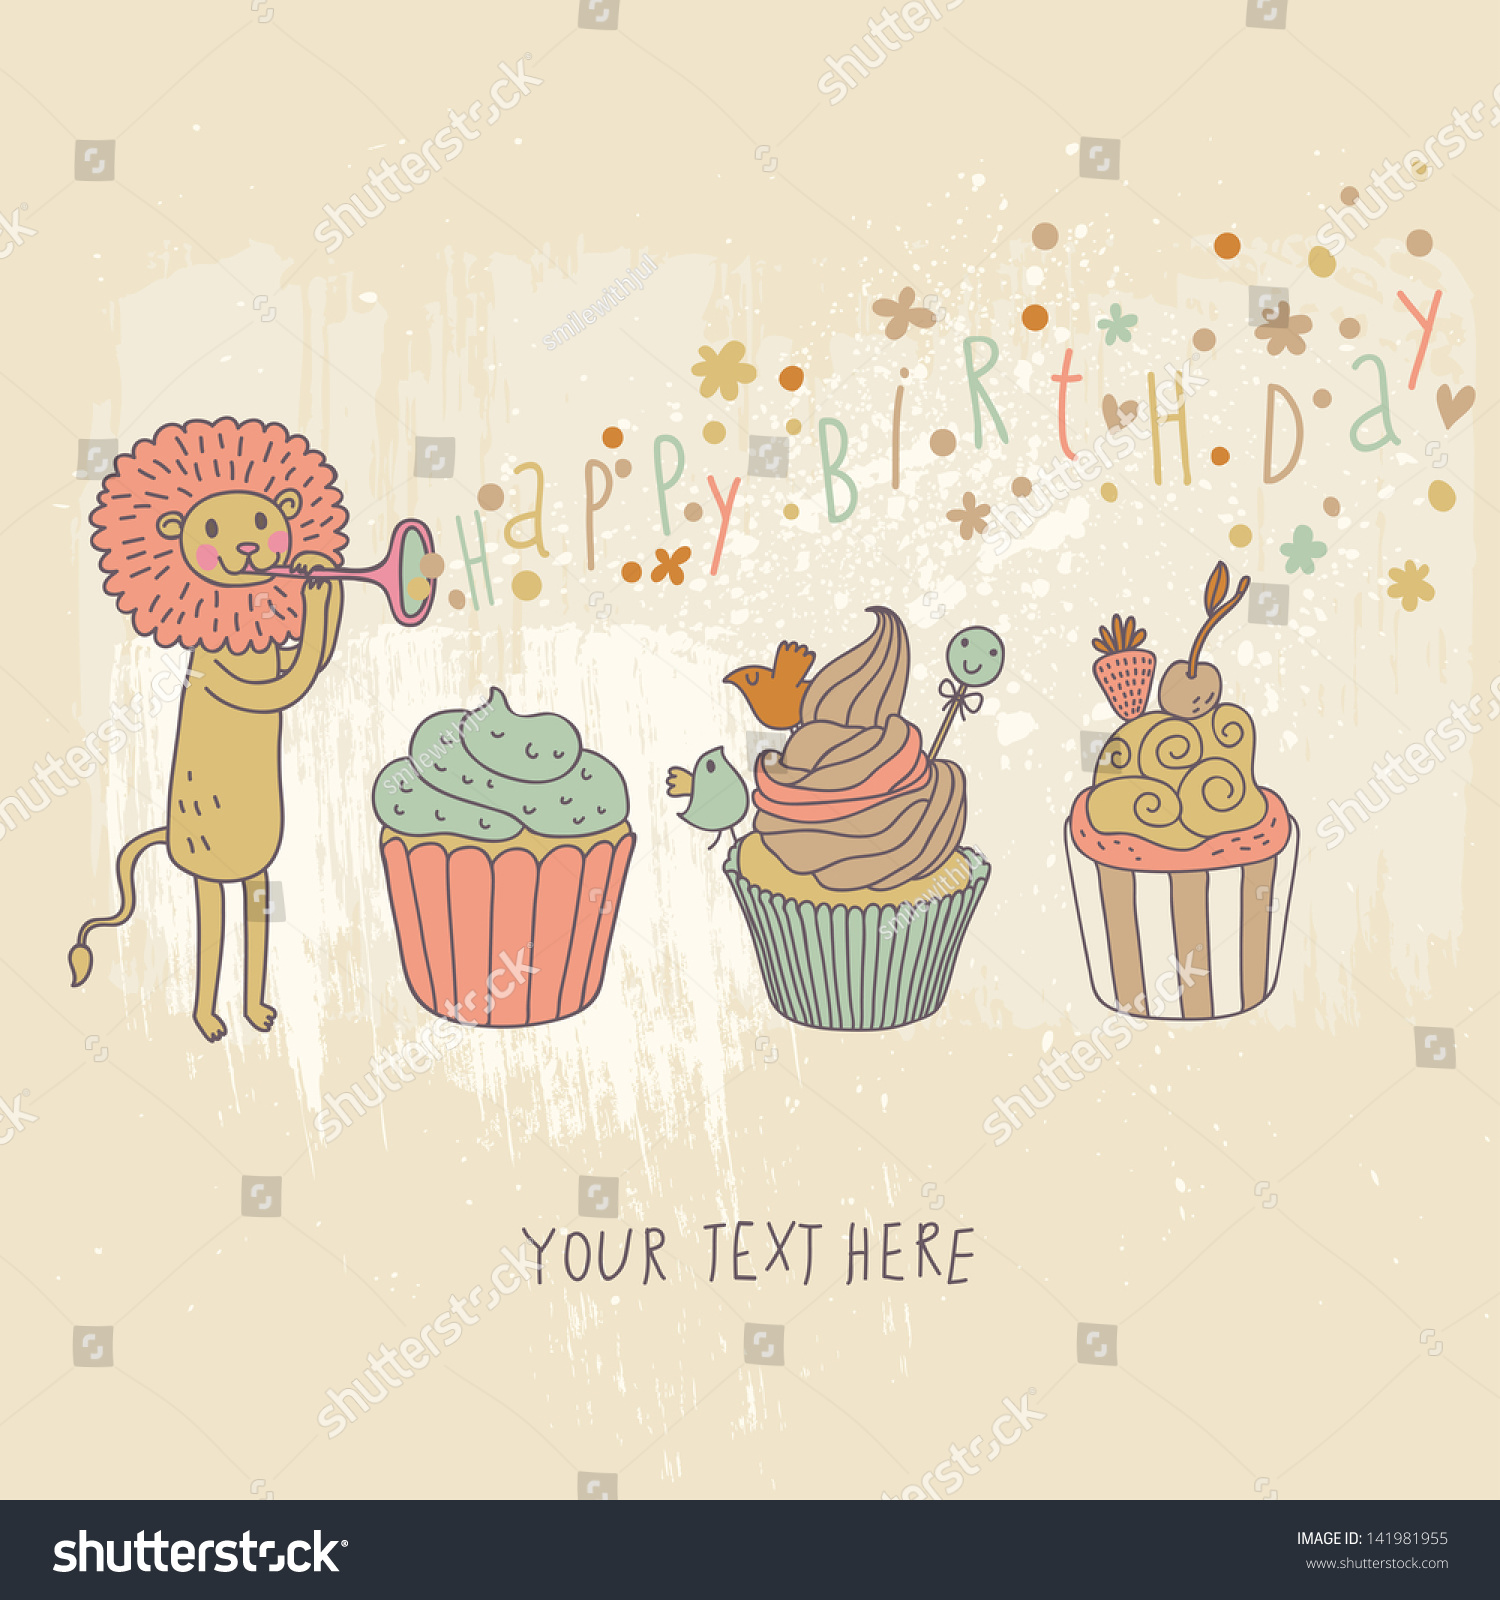 Happy Birthday Card Cartoon Holiday Wallpaper Stock Vector